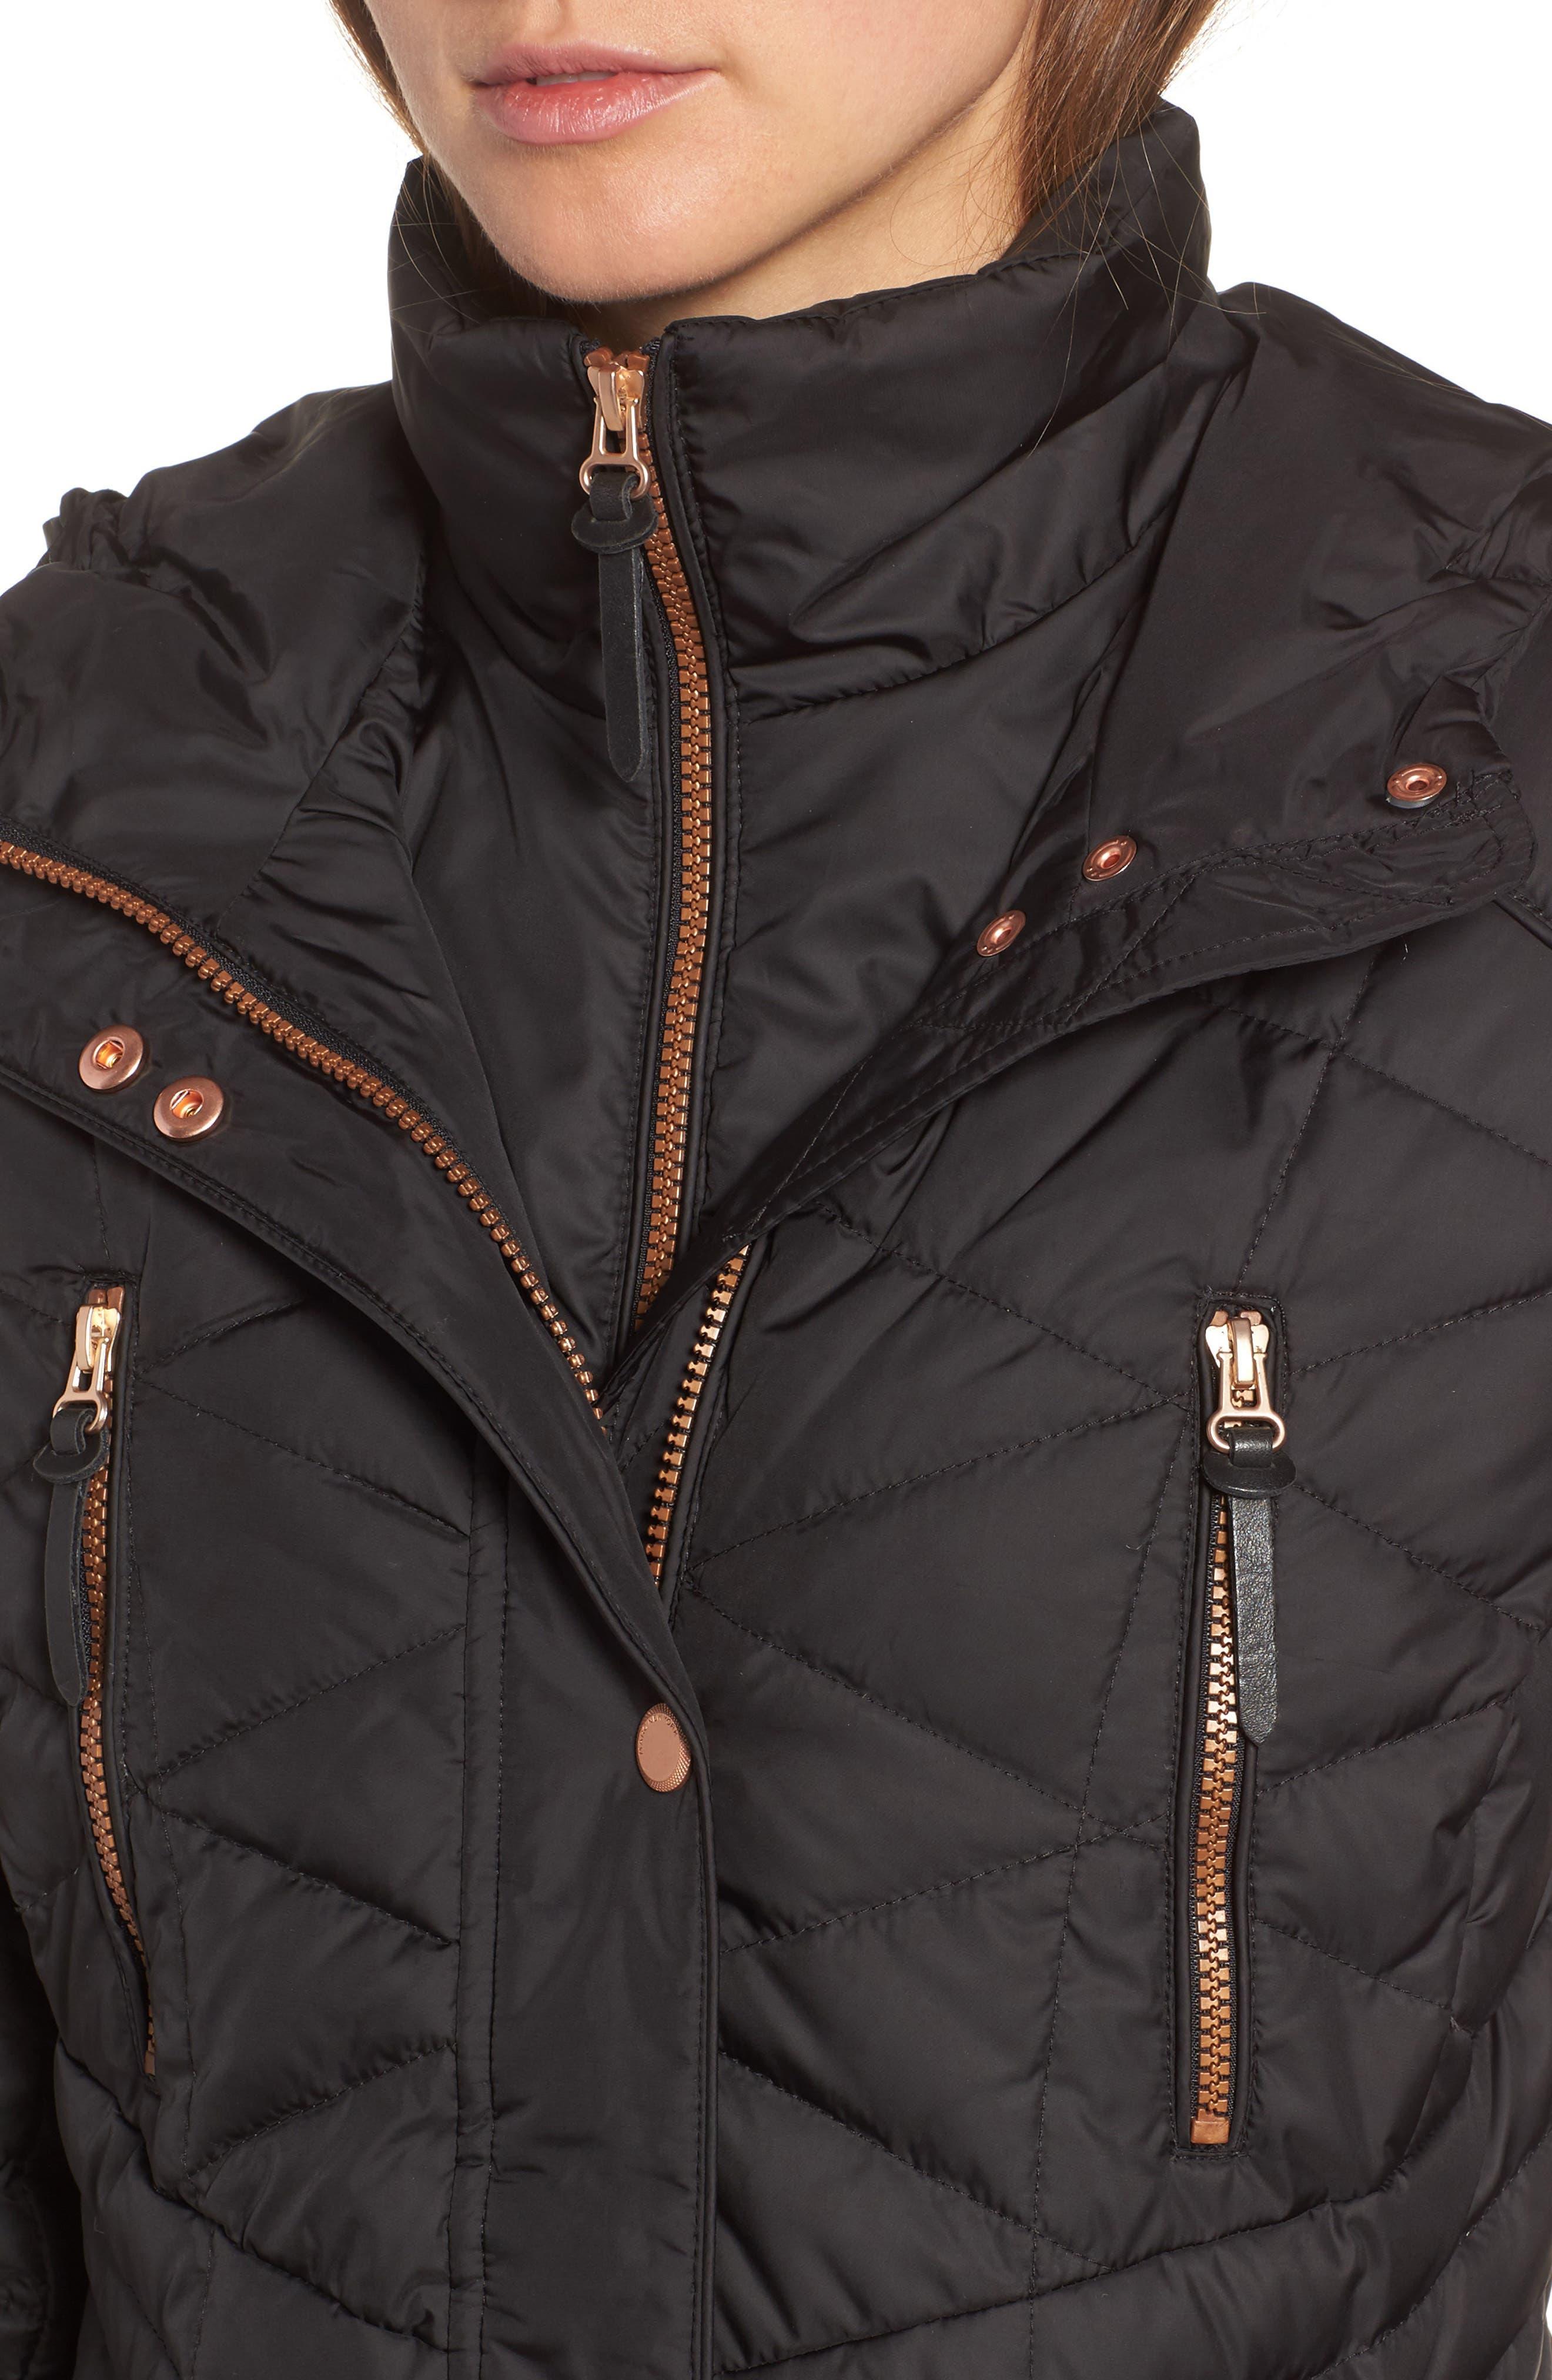 Marley 30 Coat with Detachable Faux Fur,                             Alternate thumbnail 4, color,                             001